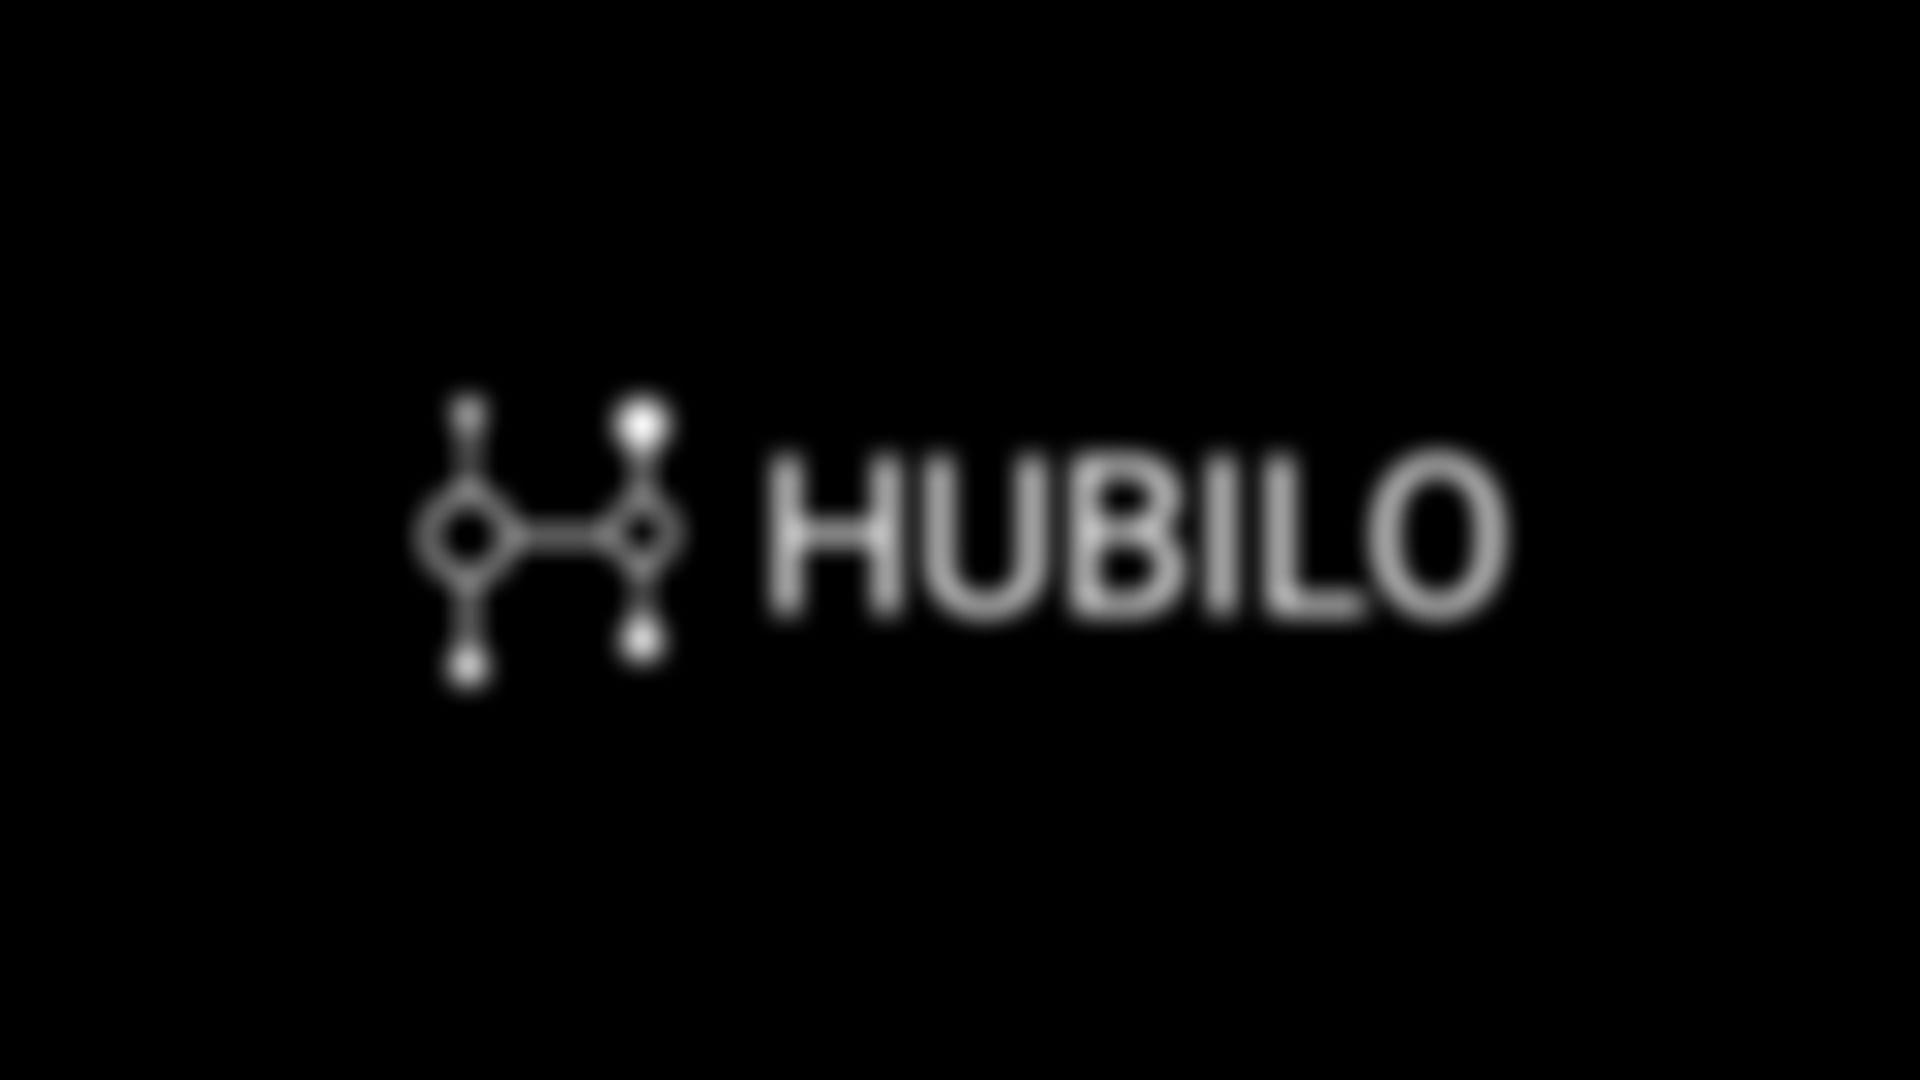 hubilo